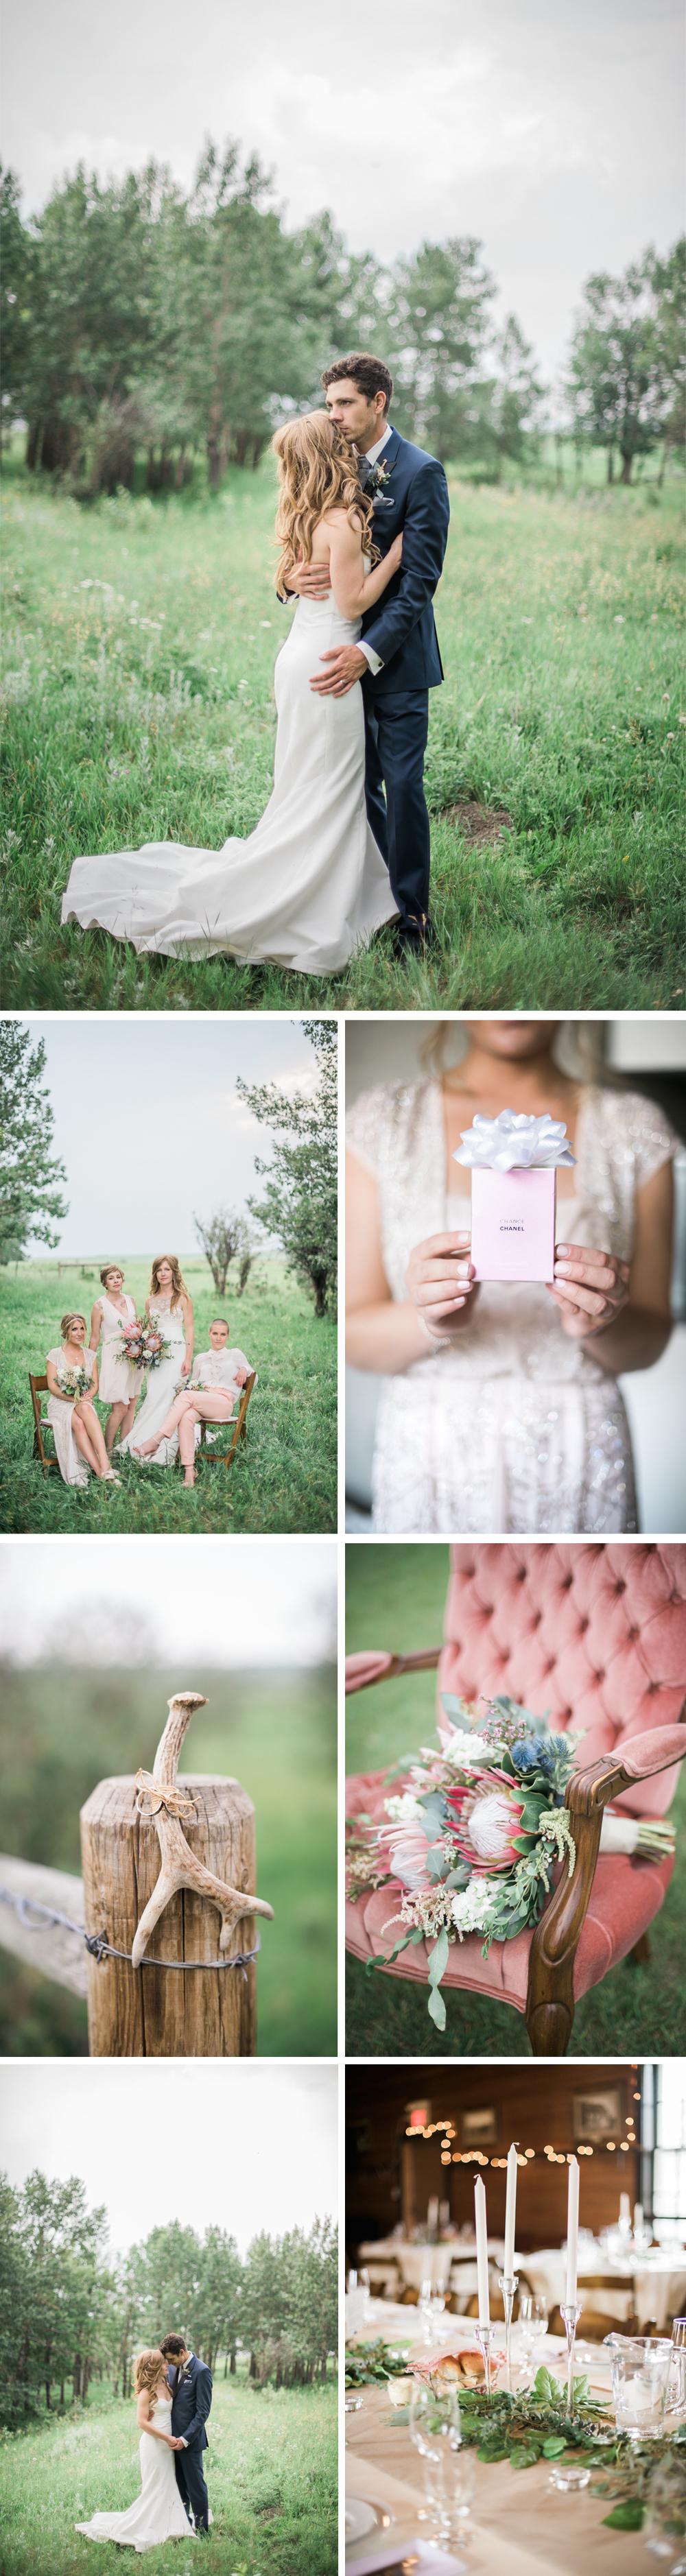 Calgary Wedding Photographer Preview